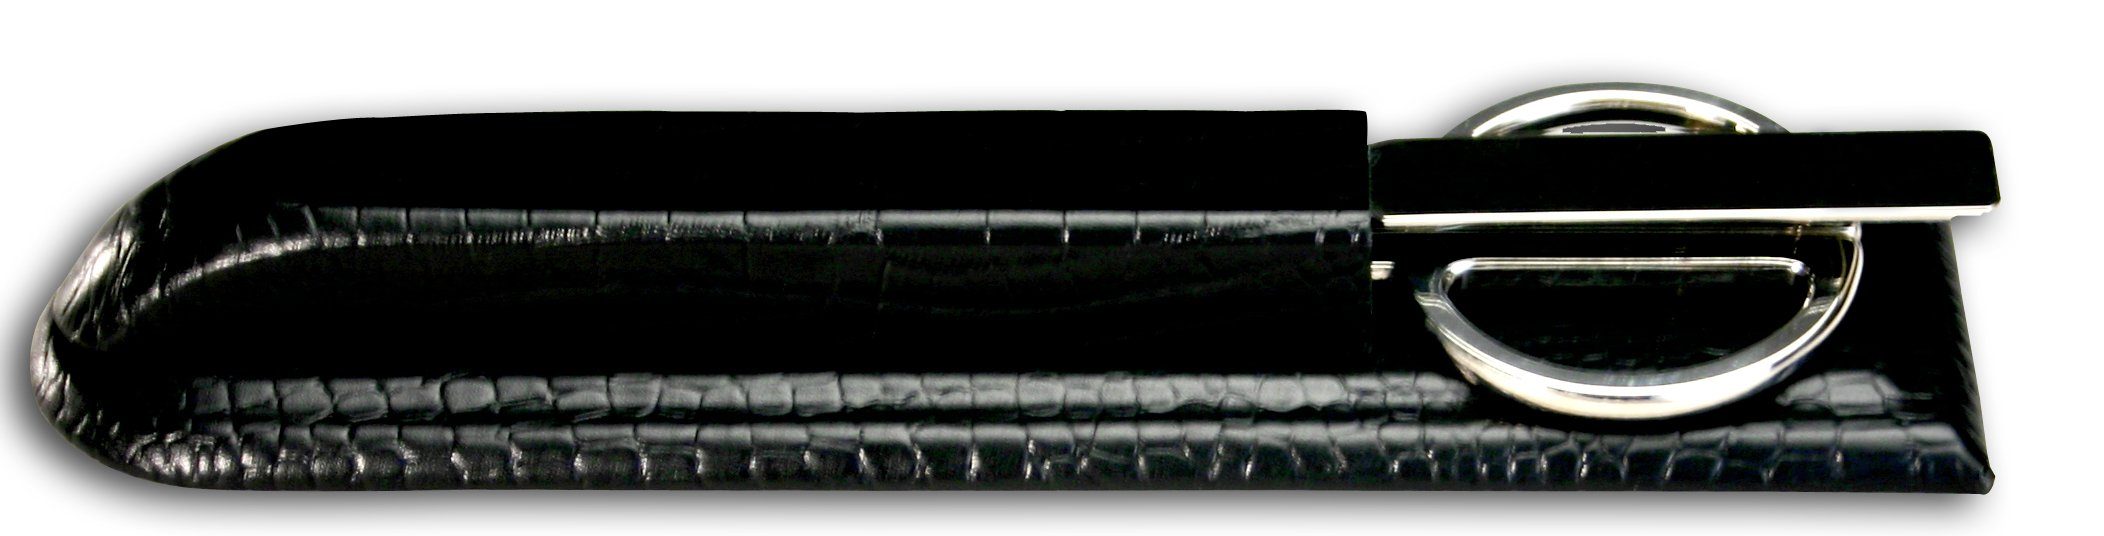 Dacasso Black Crocodile Embossed Leather Library Set